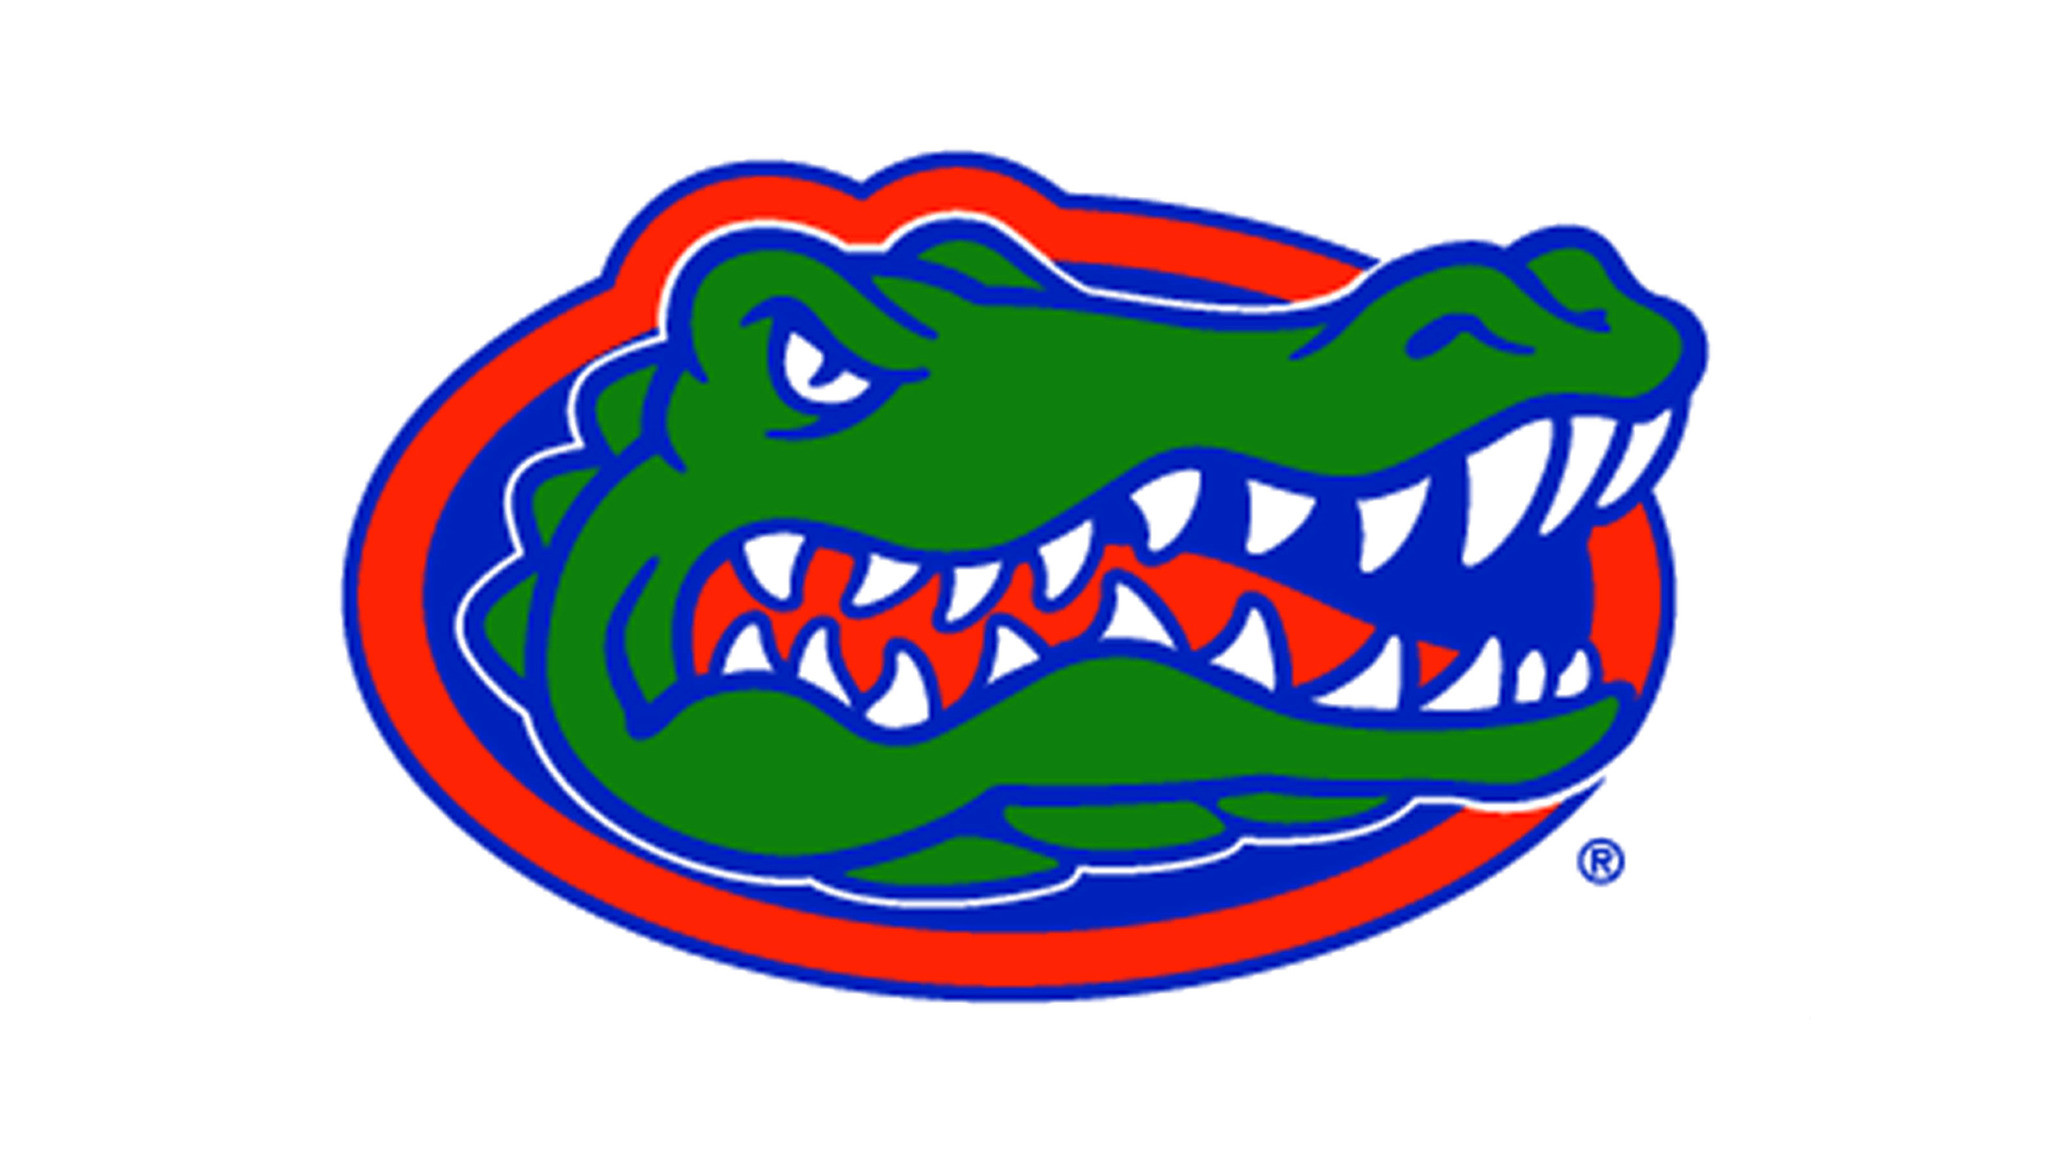 University of Florida Gators Football vs. Louisiana State University  Football